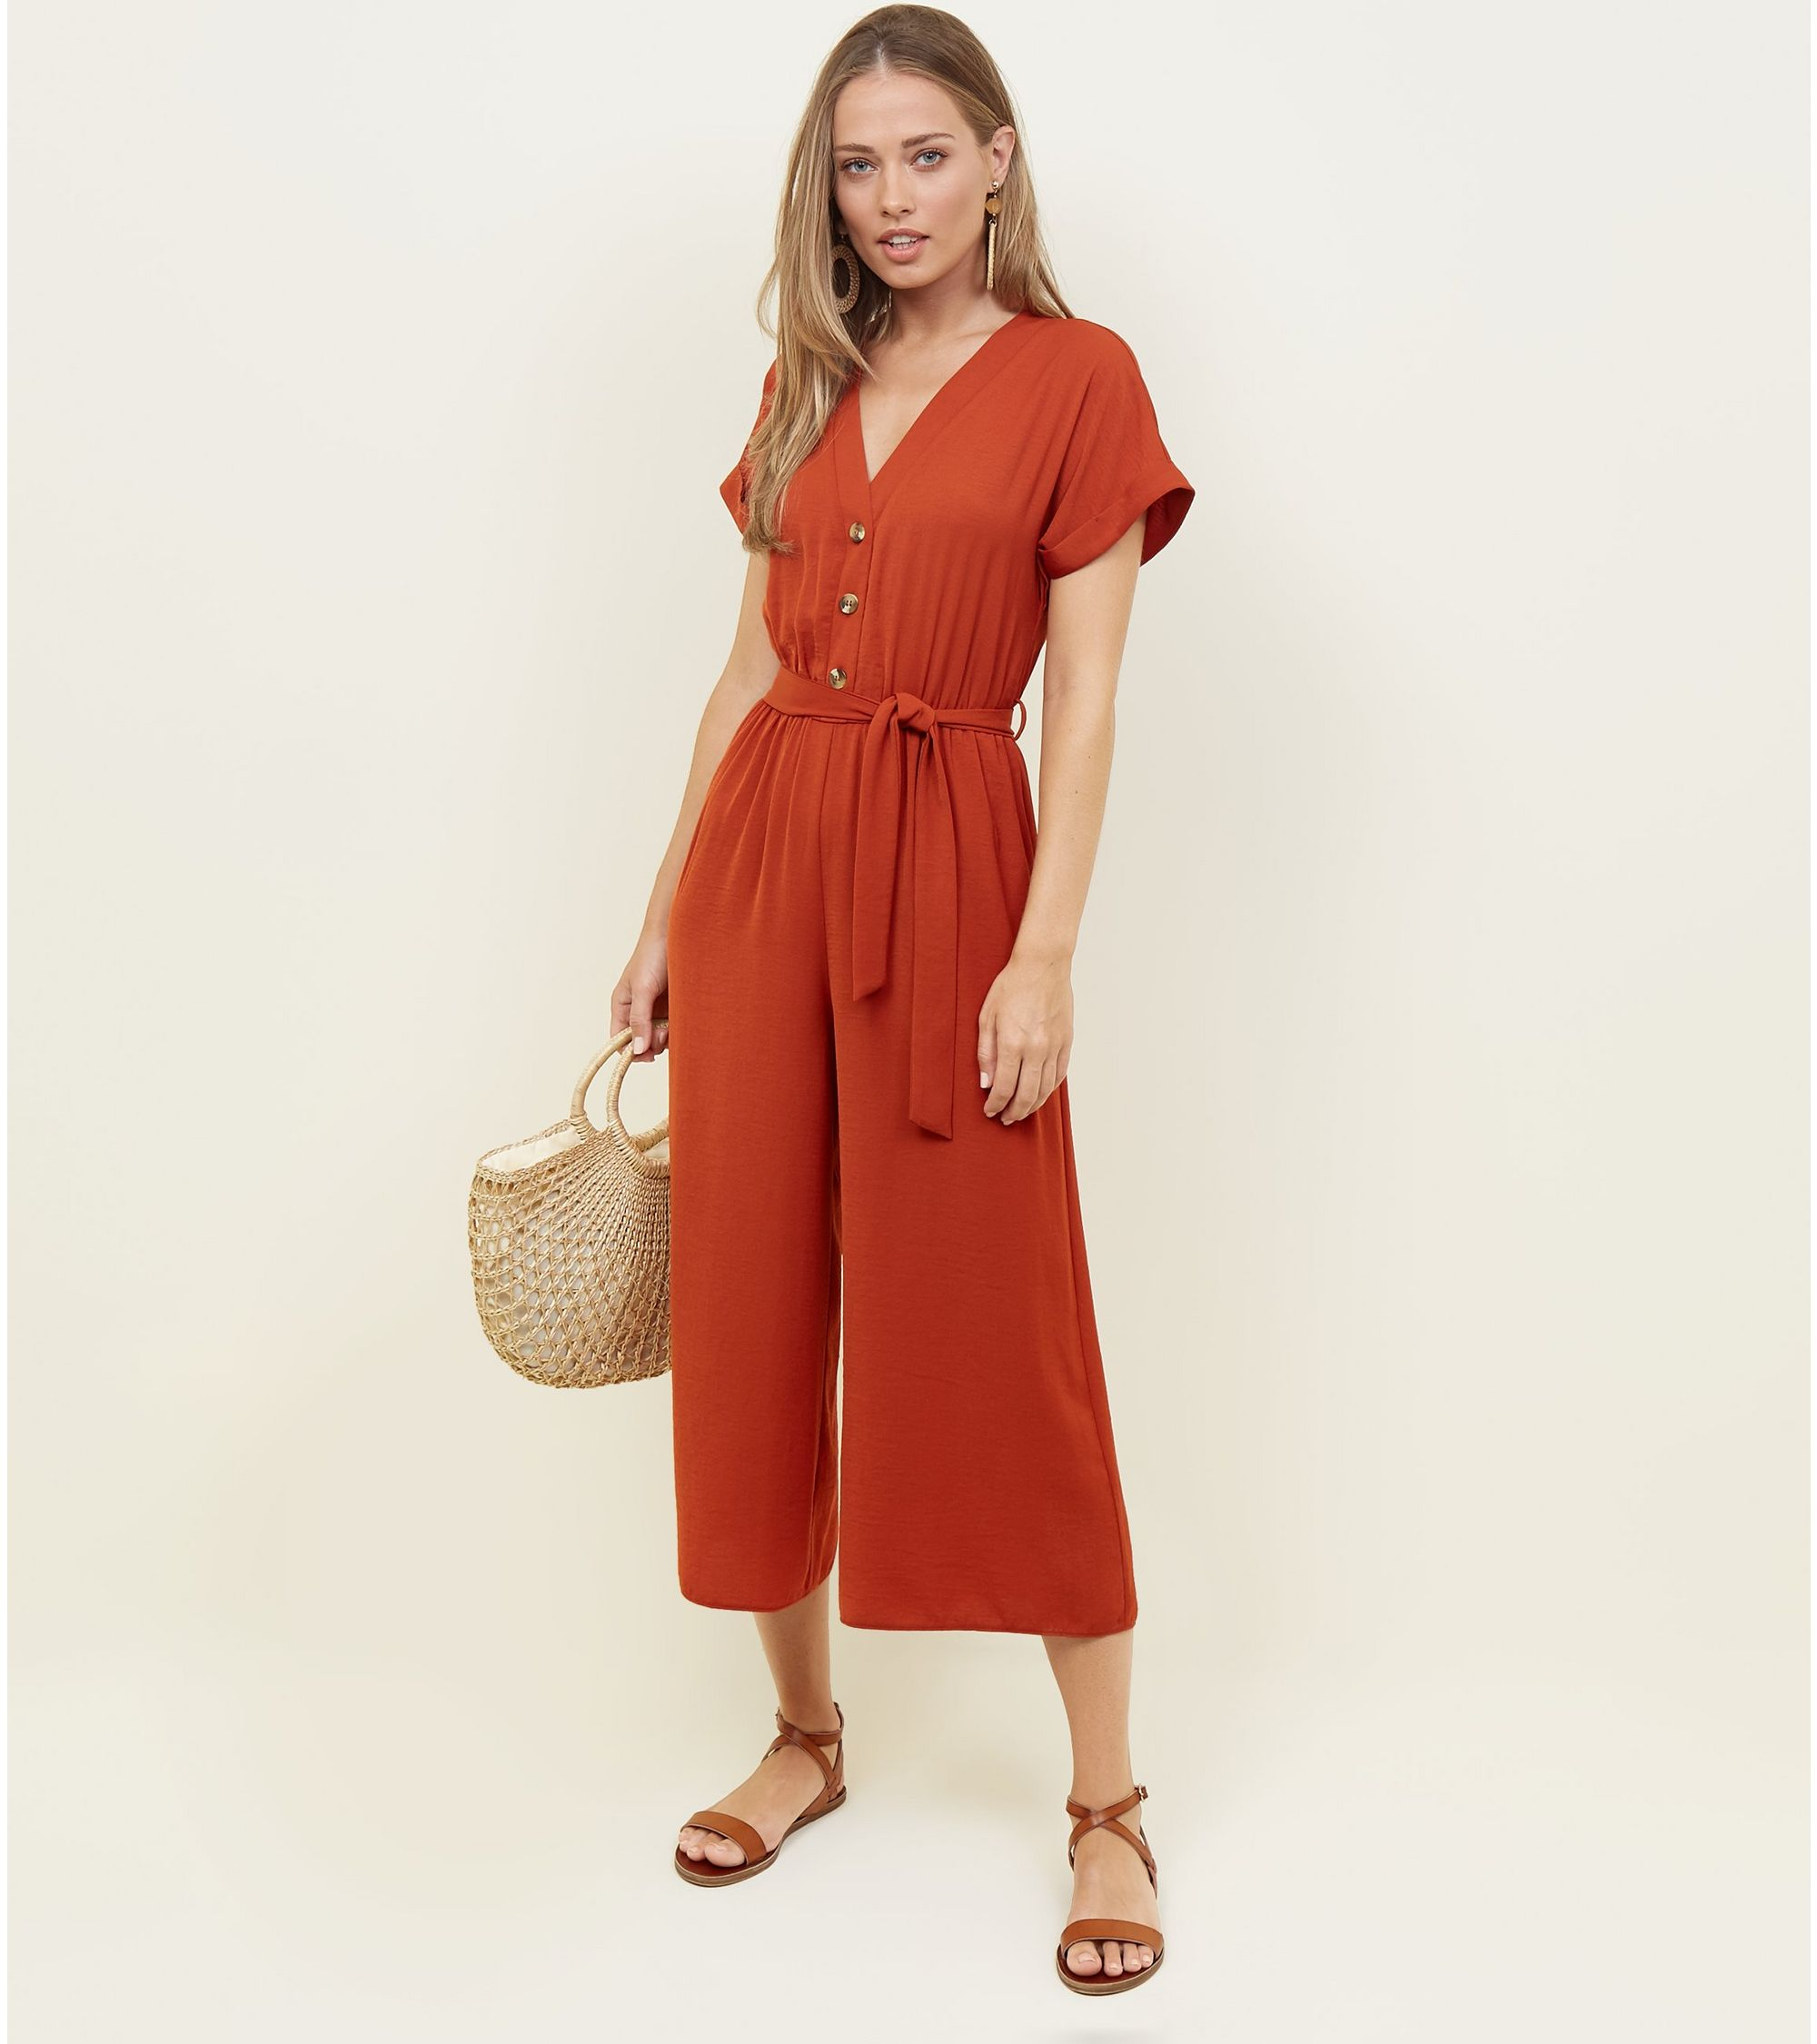 c942b2ba35 New Look Orange Button Front Linen-Look Jumpsuit at £18.74